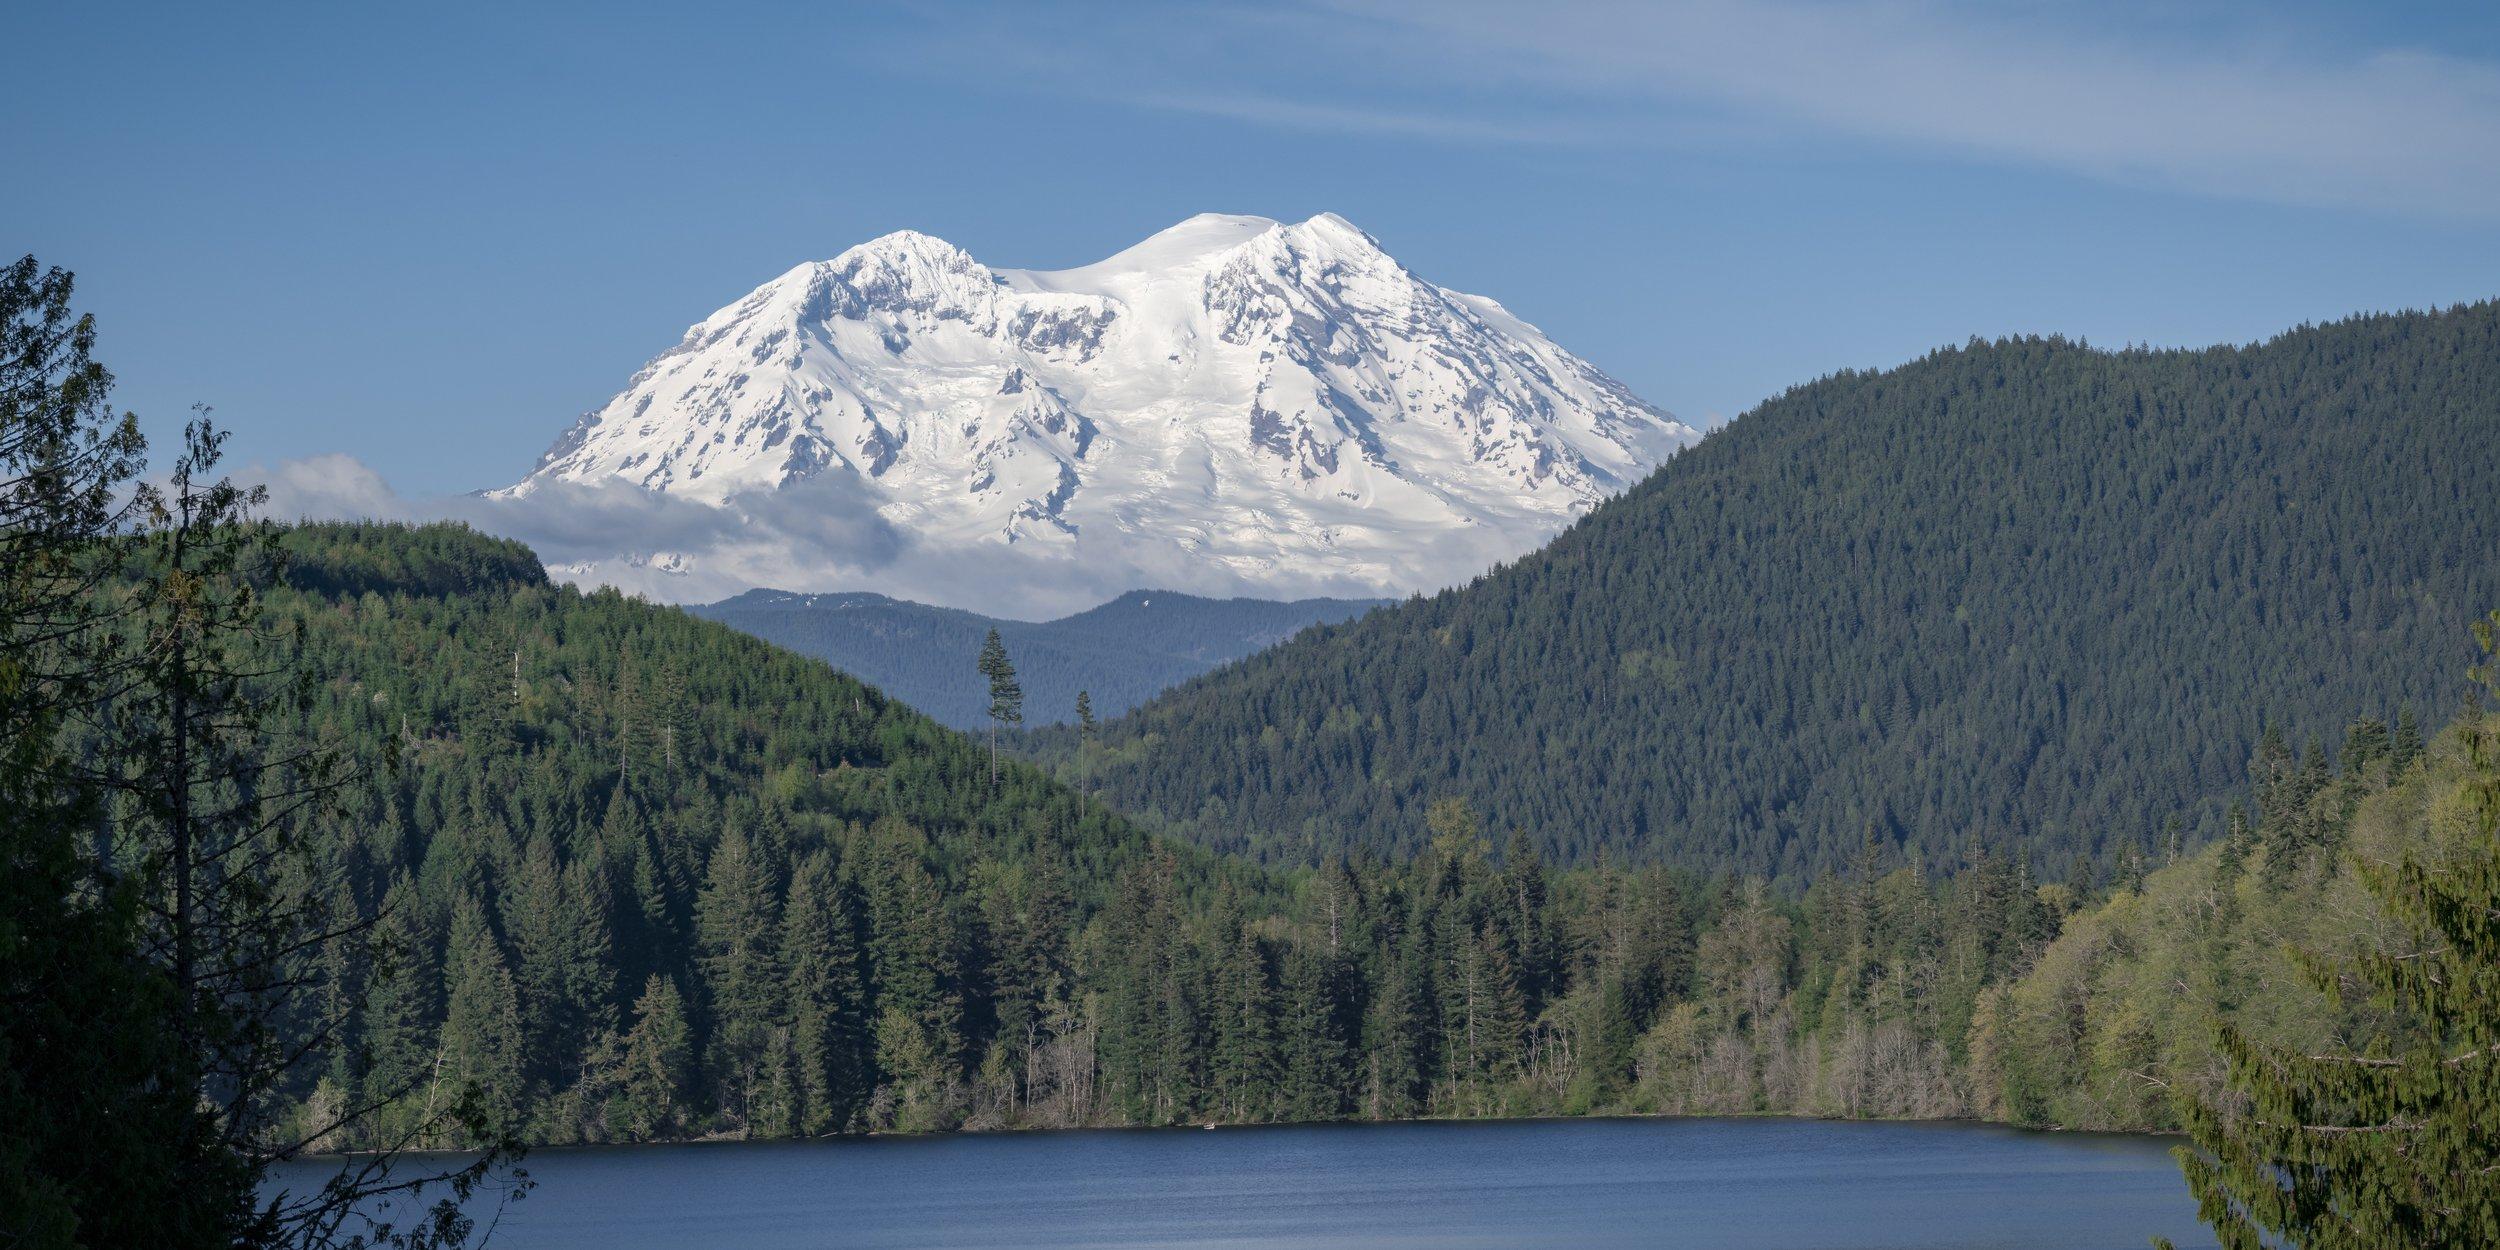 Mt_Rainier_Blue_Sky_by_Mineral_Lake.jpeg